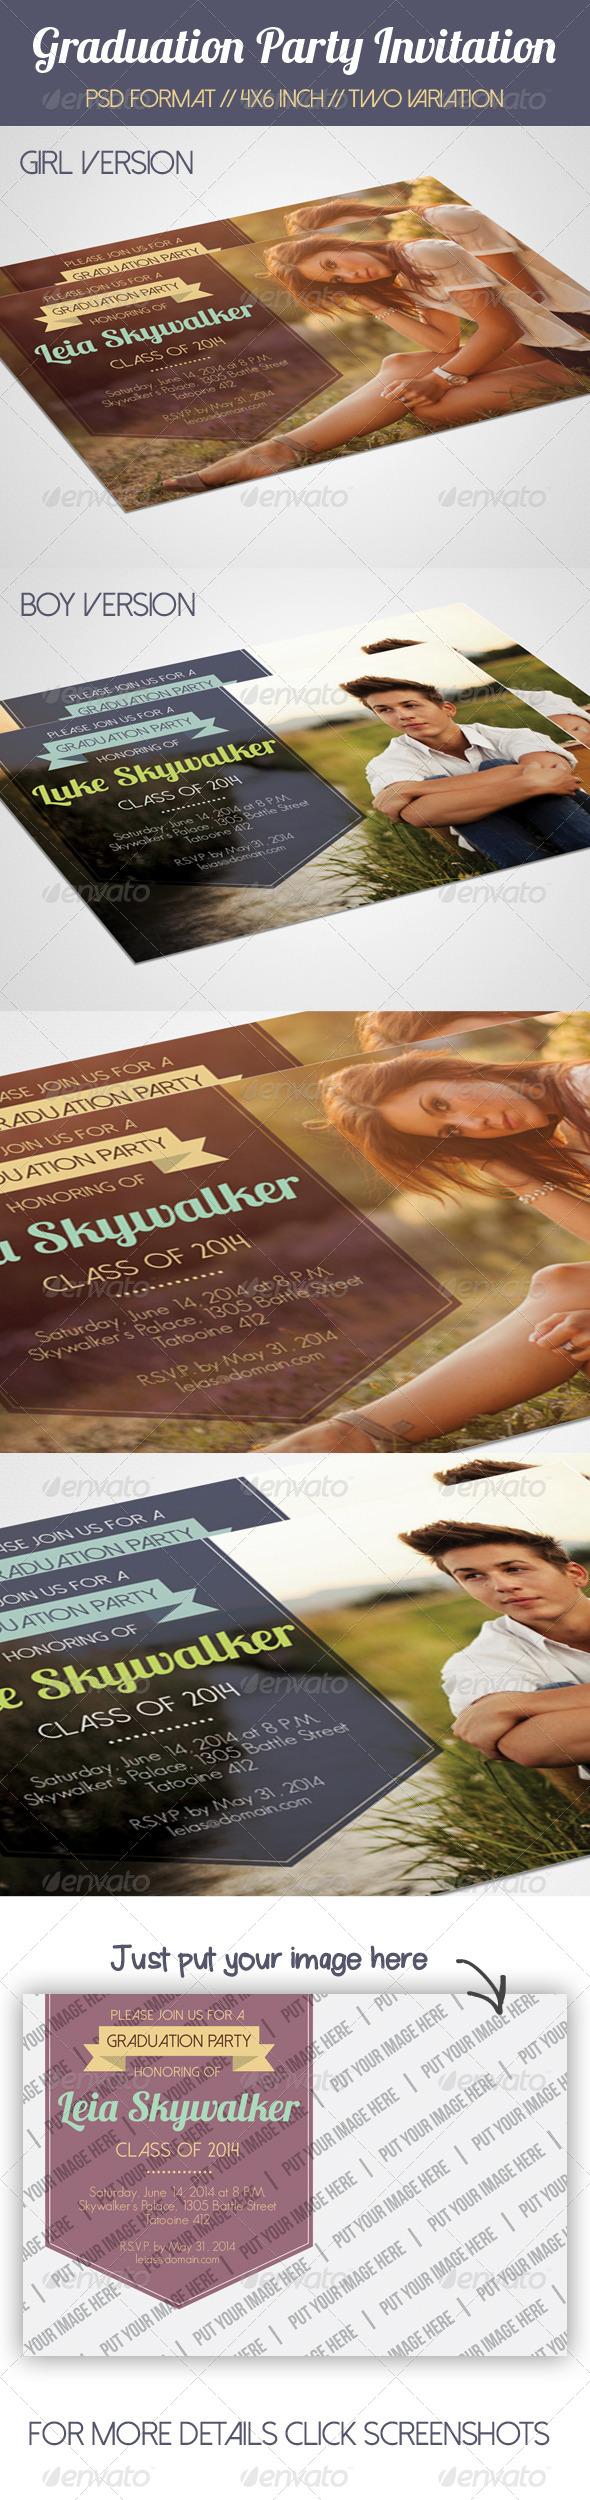 GraphicRiver Simple Graduation Party Invitation 7744241